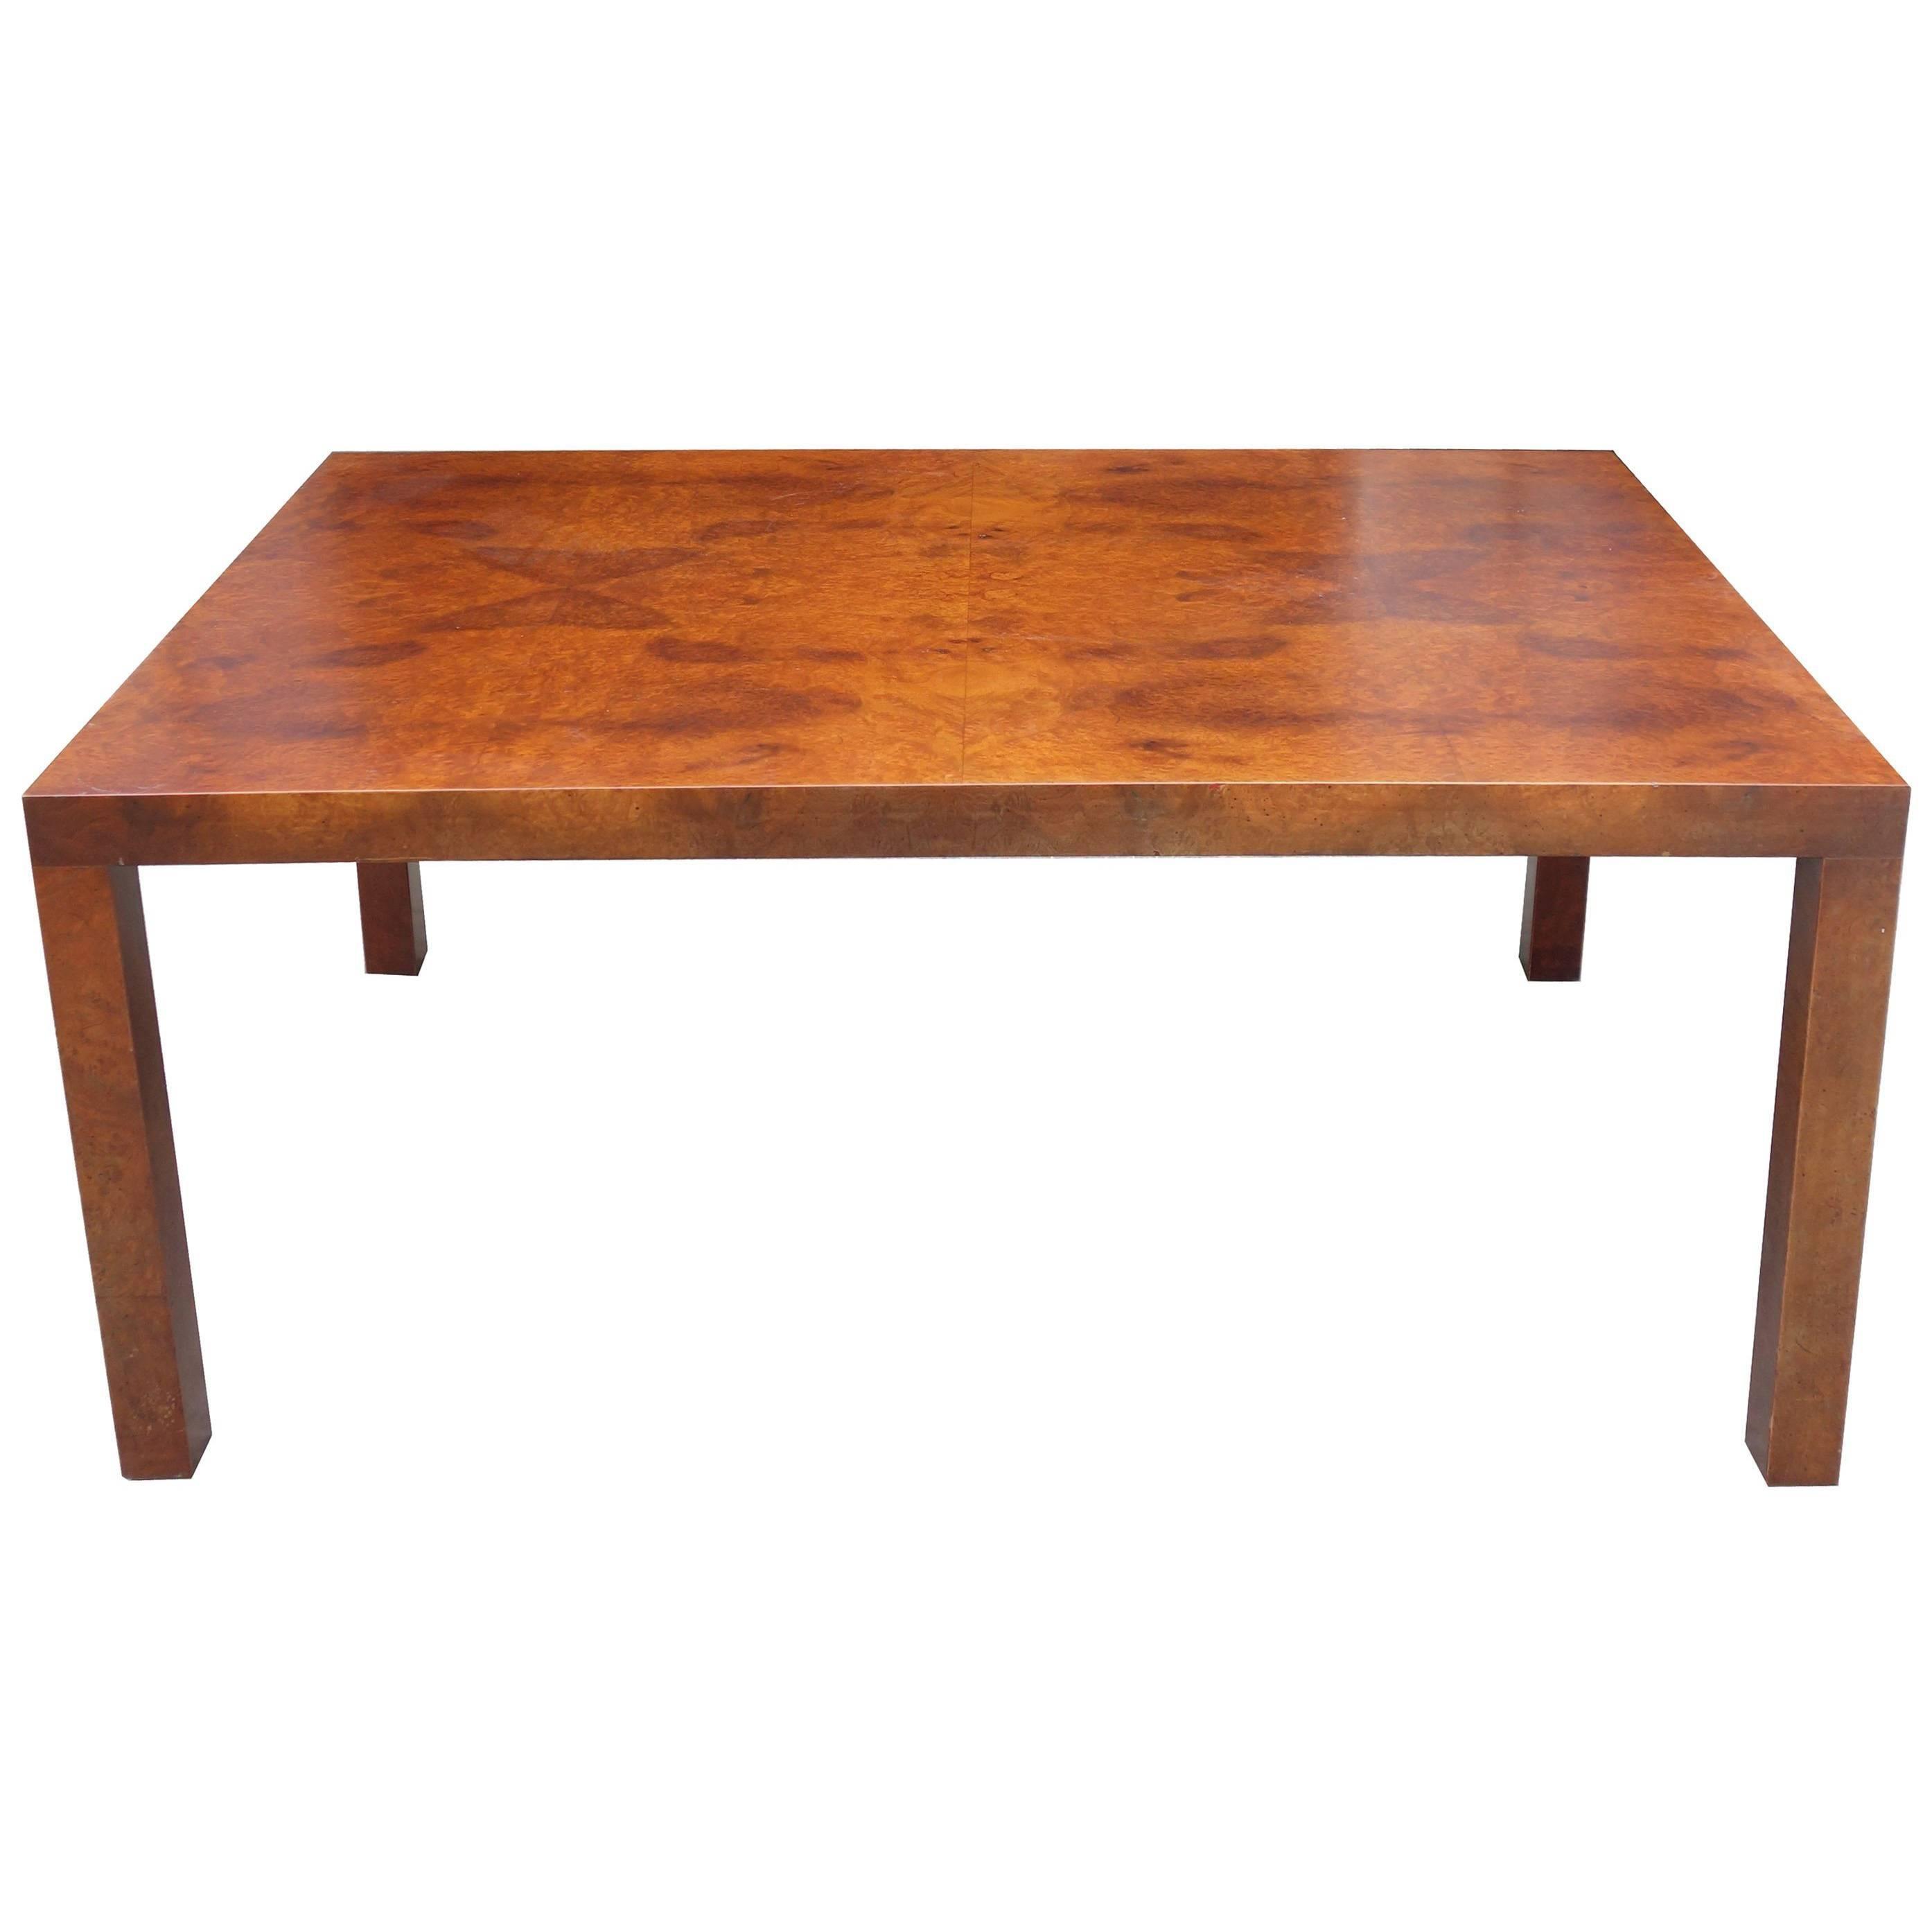 Midcentury Milo Baughman Burl Wood Coffee Table For Sale